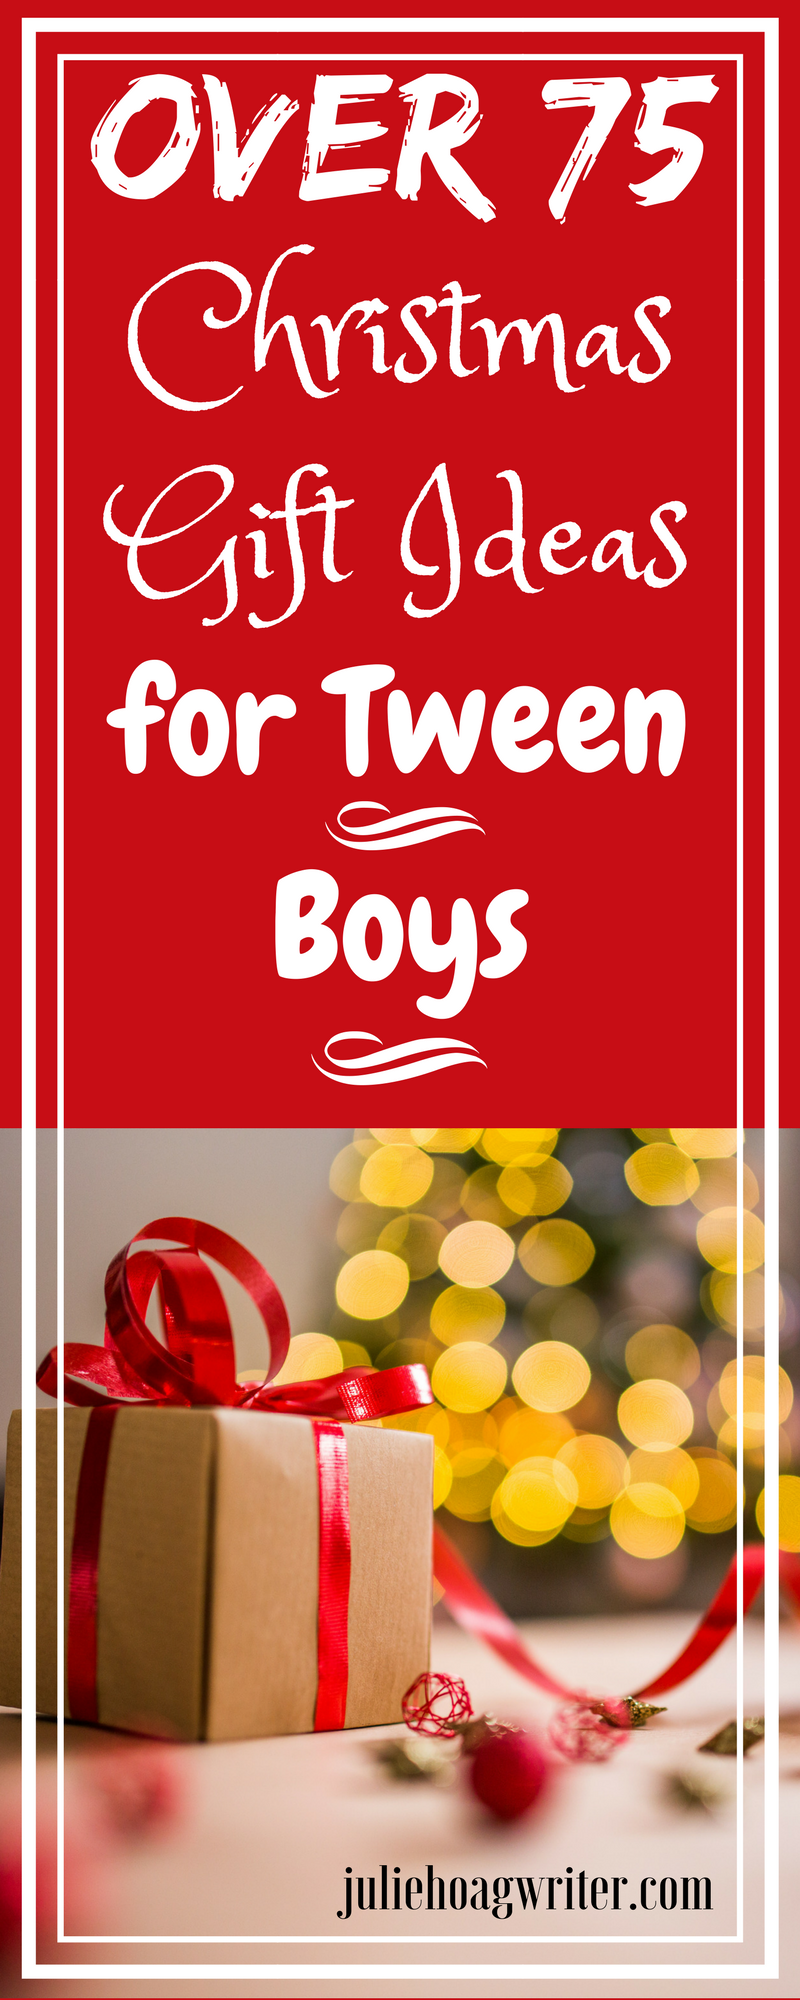 Over 75 Christmas Gift Ideas for Tween Boys